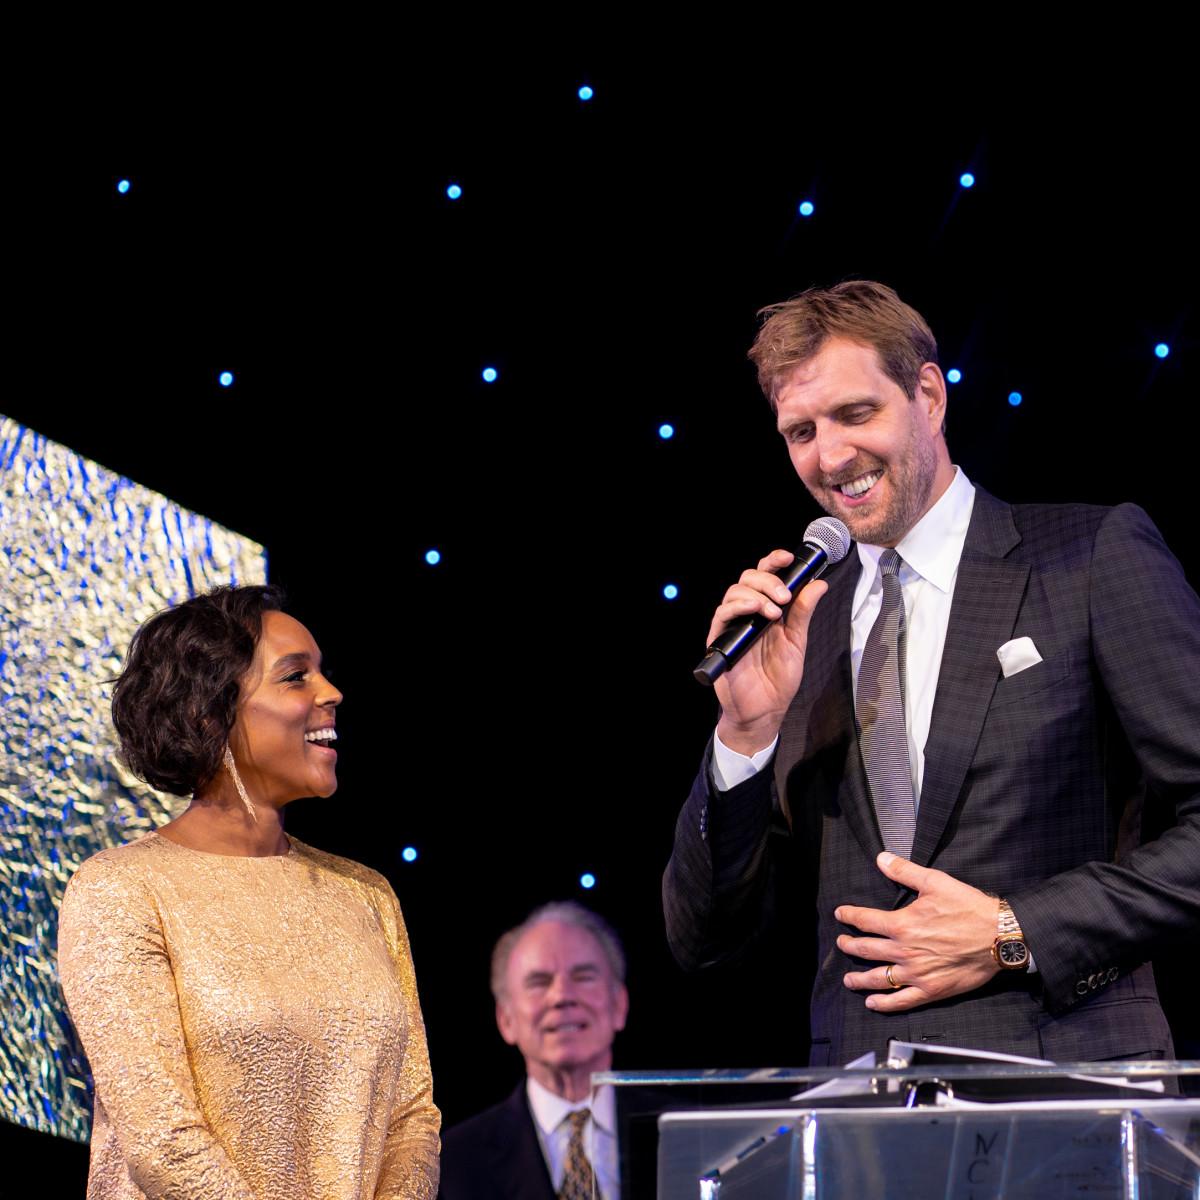 Jessica and Dirk Nowitzki accept award.